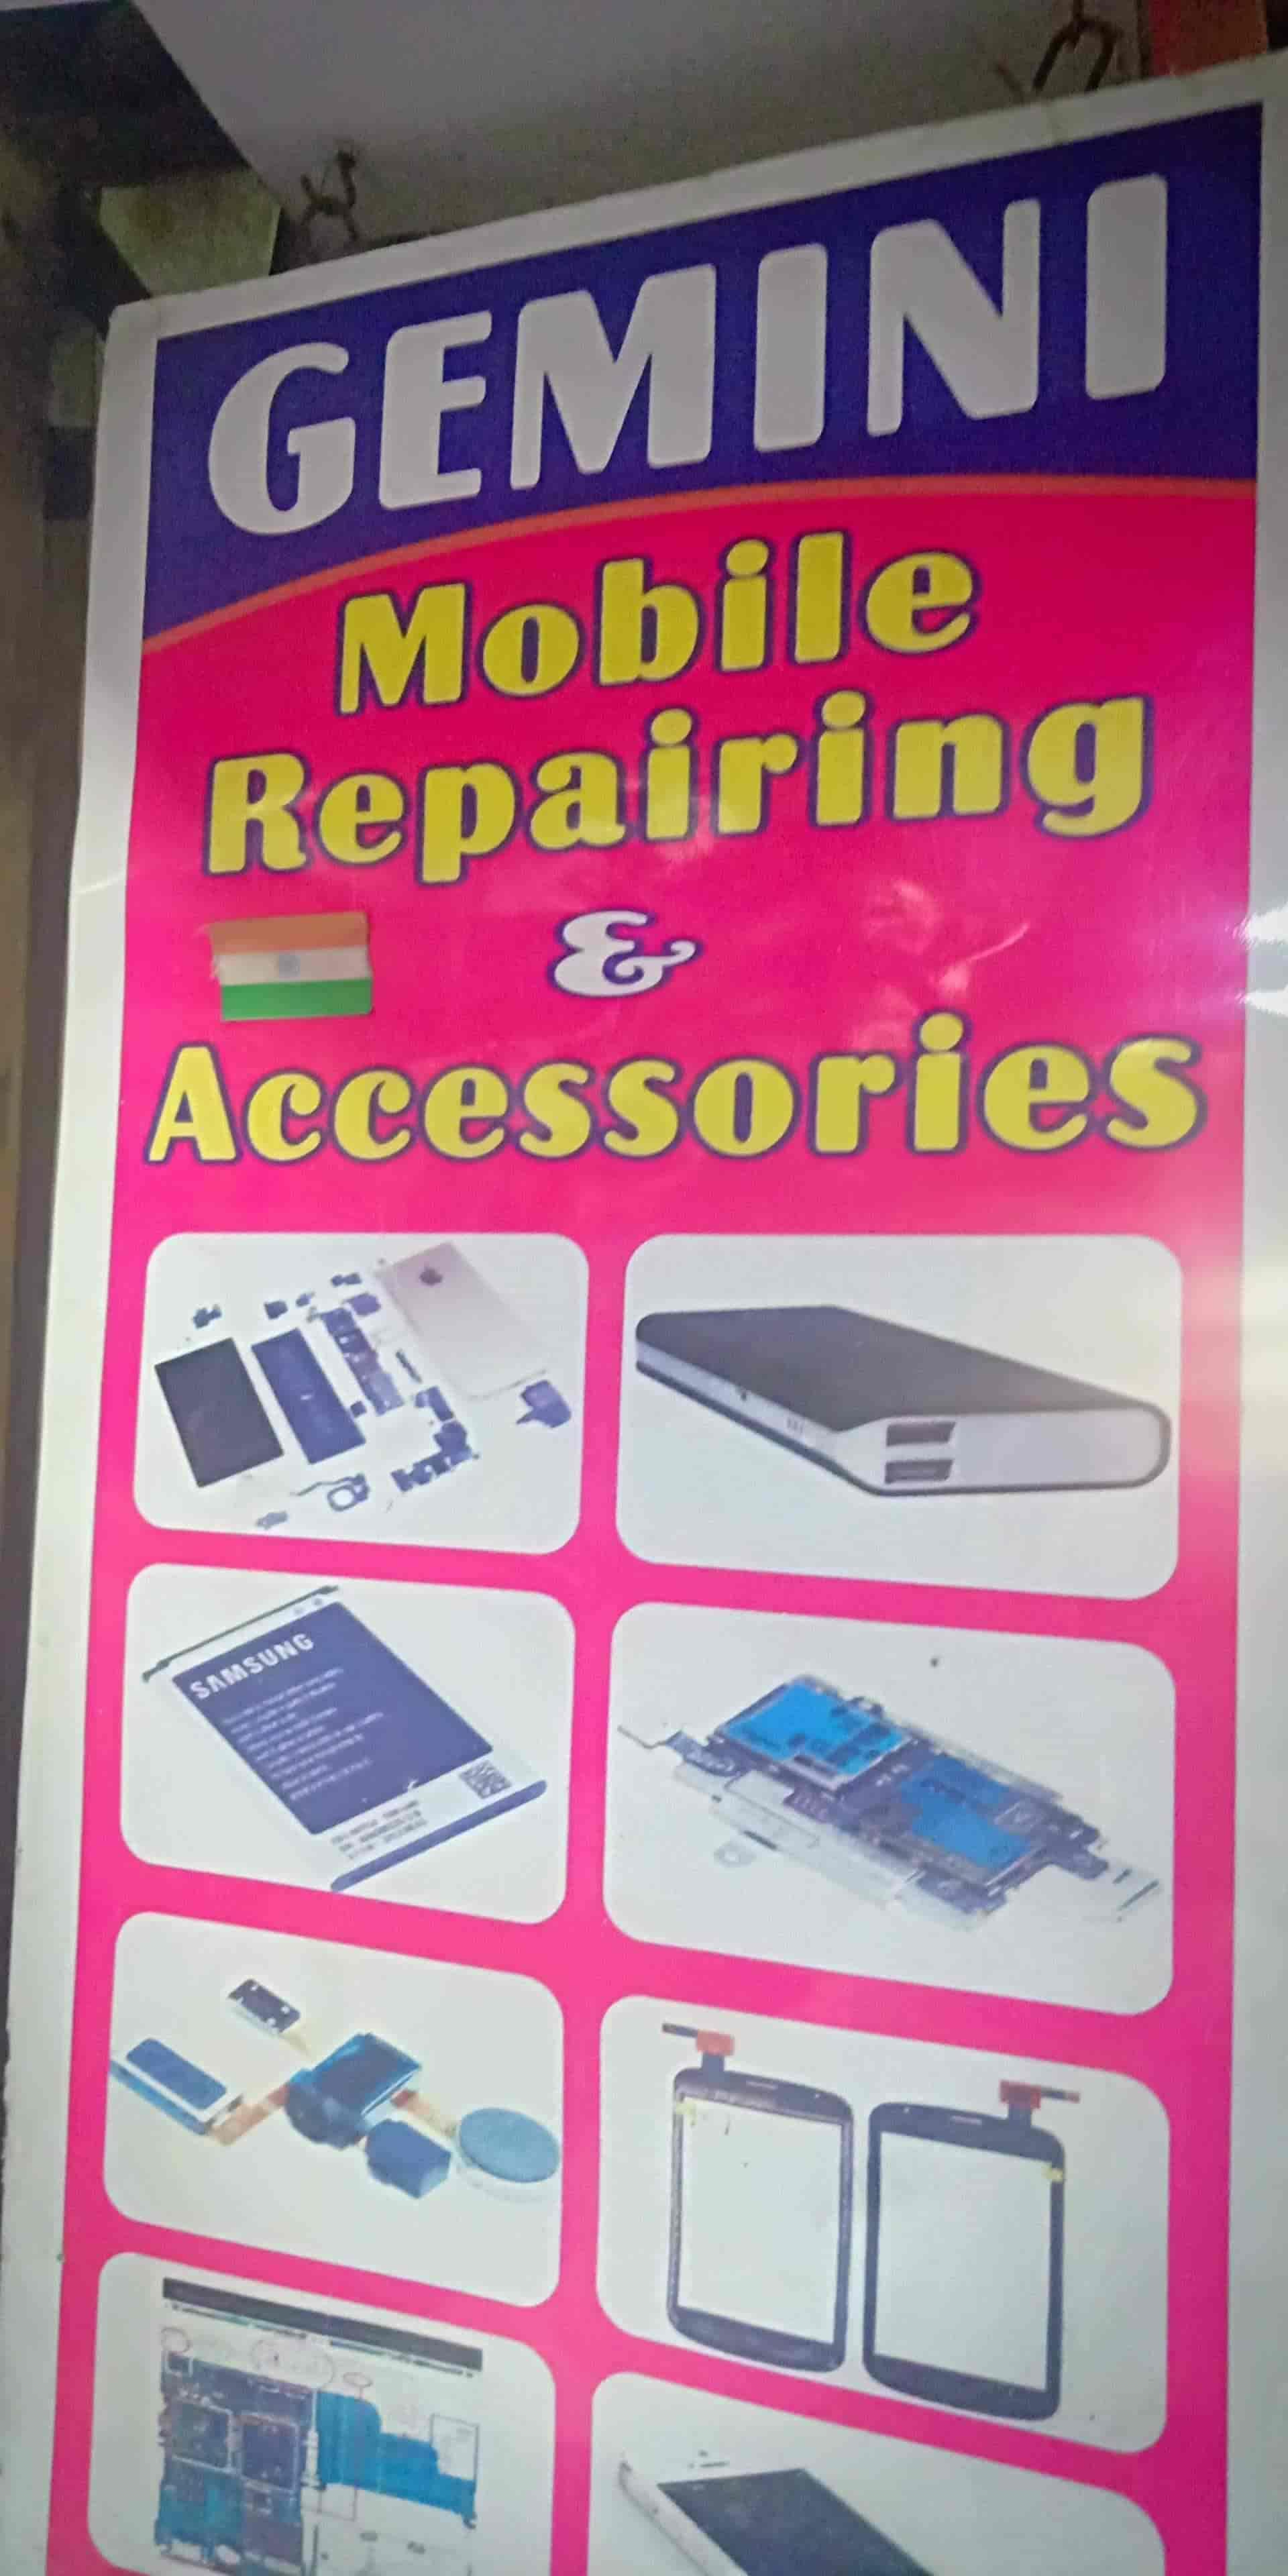 Gemini Mobile Repairing And Accessories, Sion - Mobile Phone Dealers